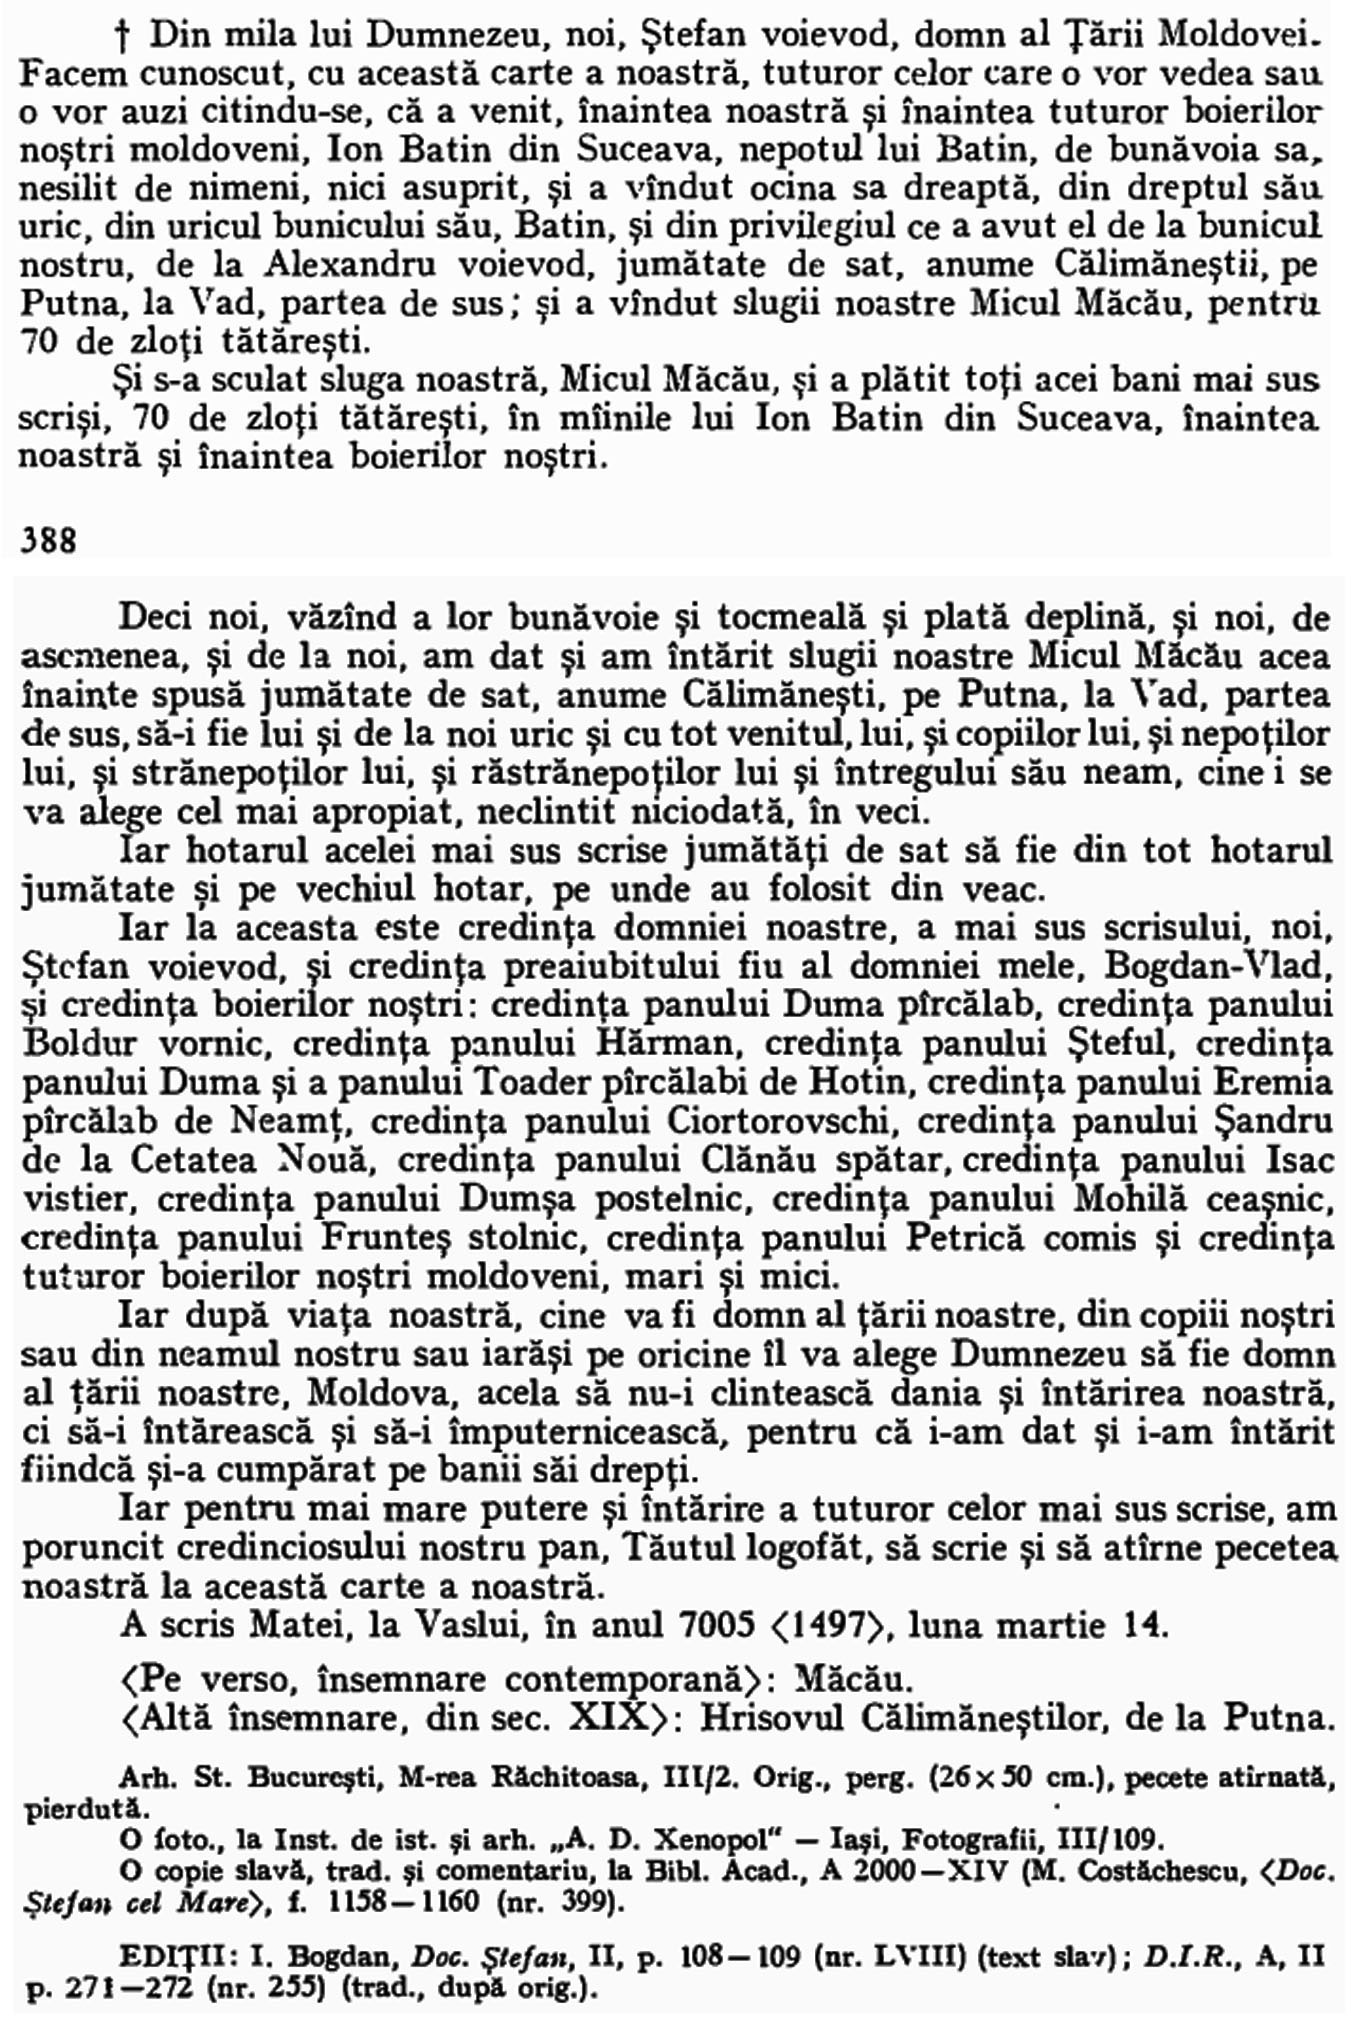 Brahatesti vol 1 Batin 1497